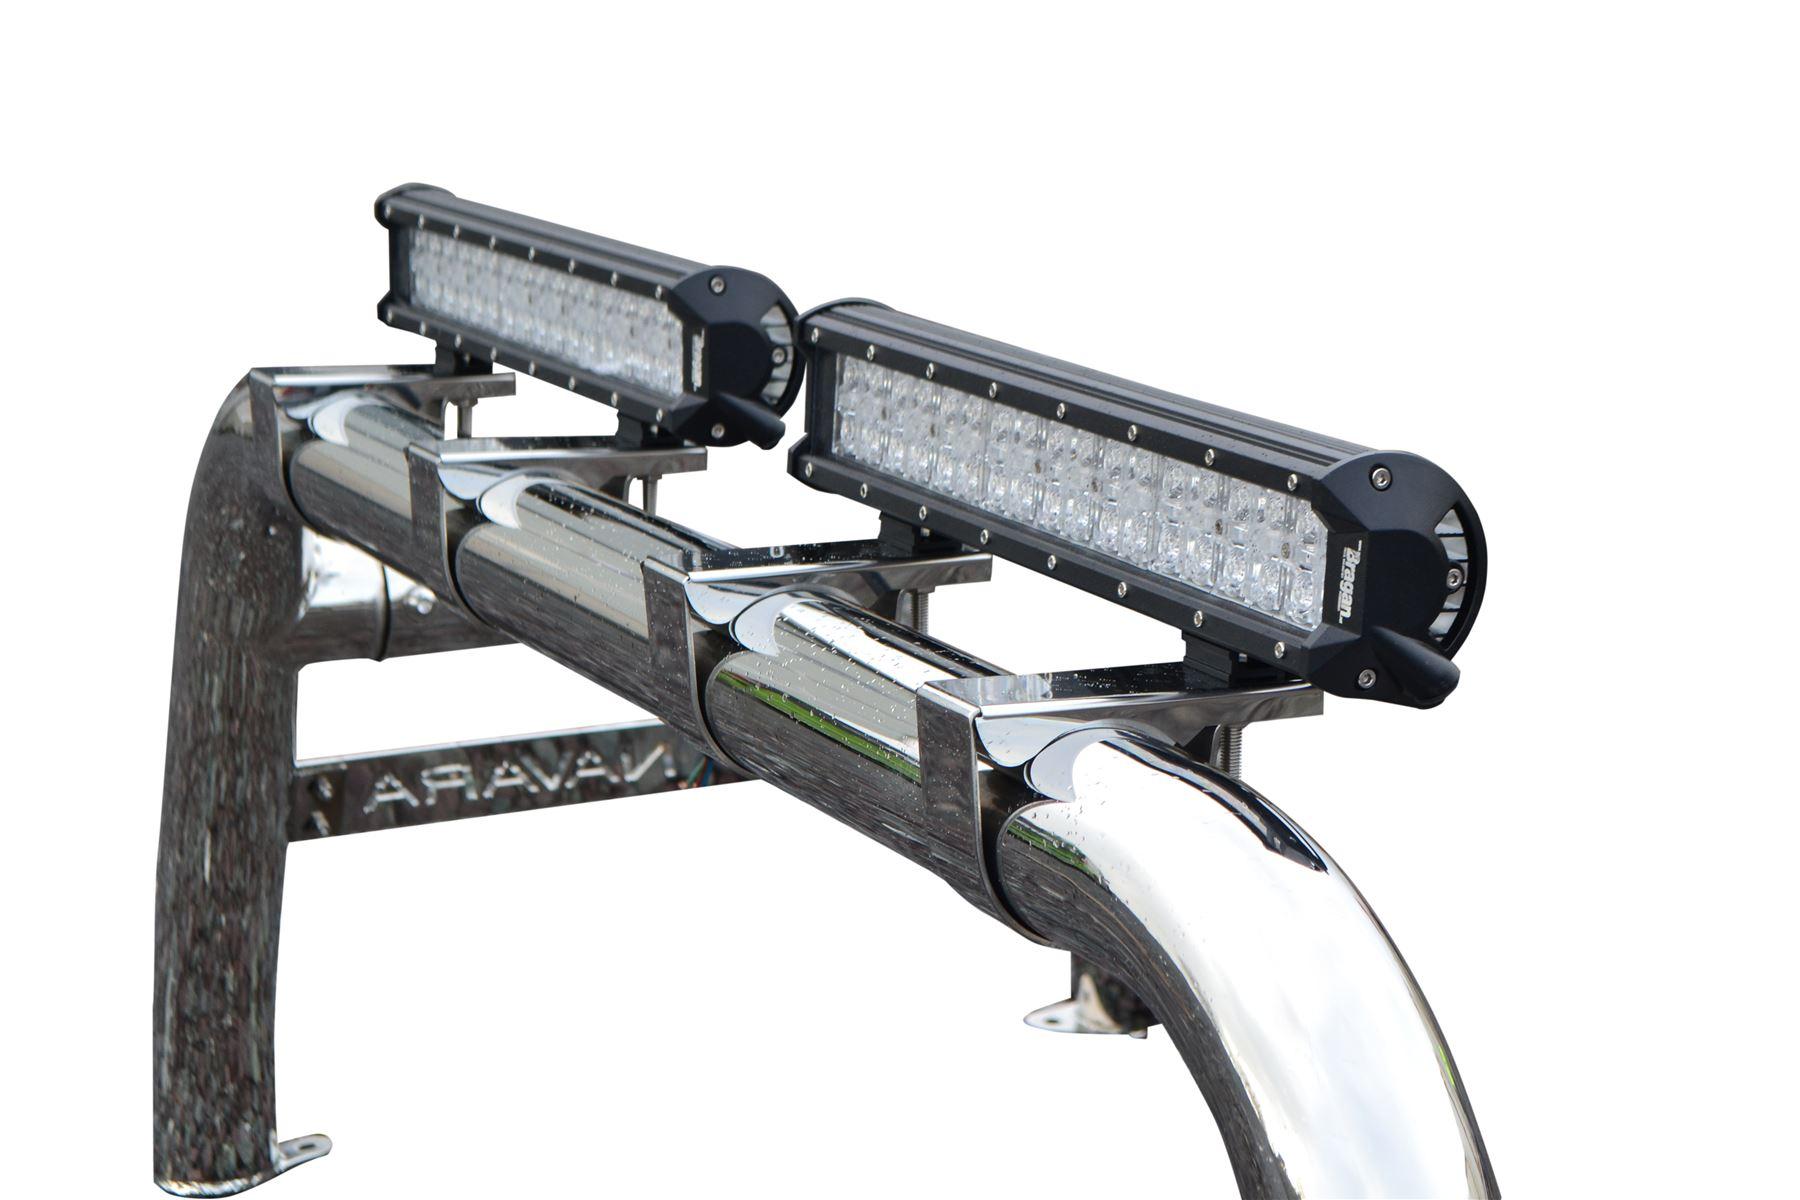 nissan navara np300 nudge bar fitting instructions